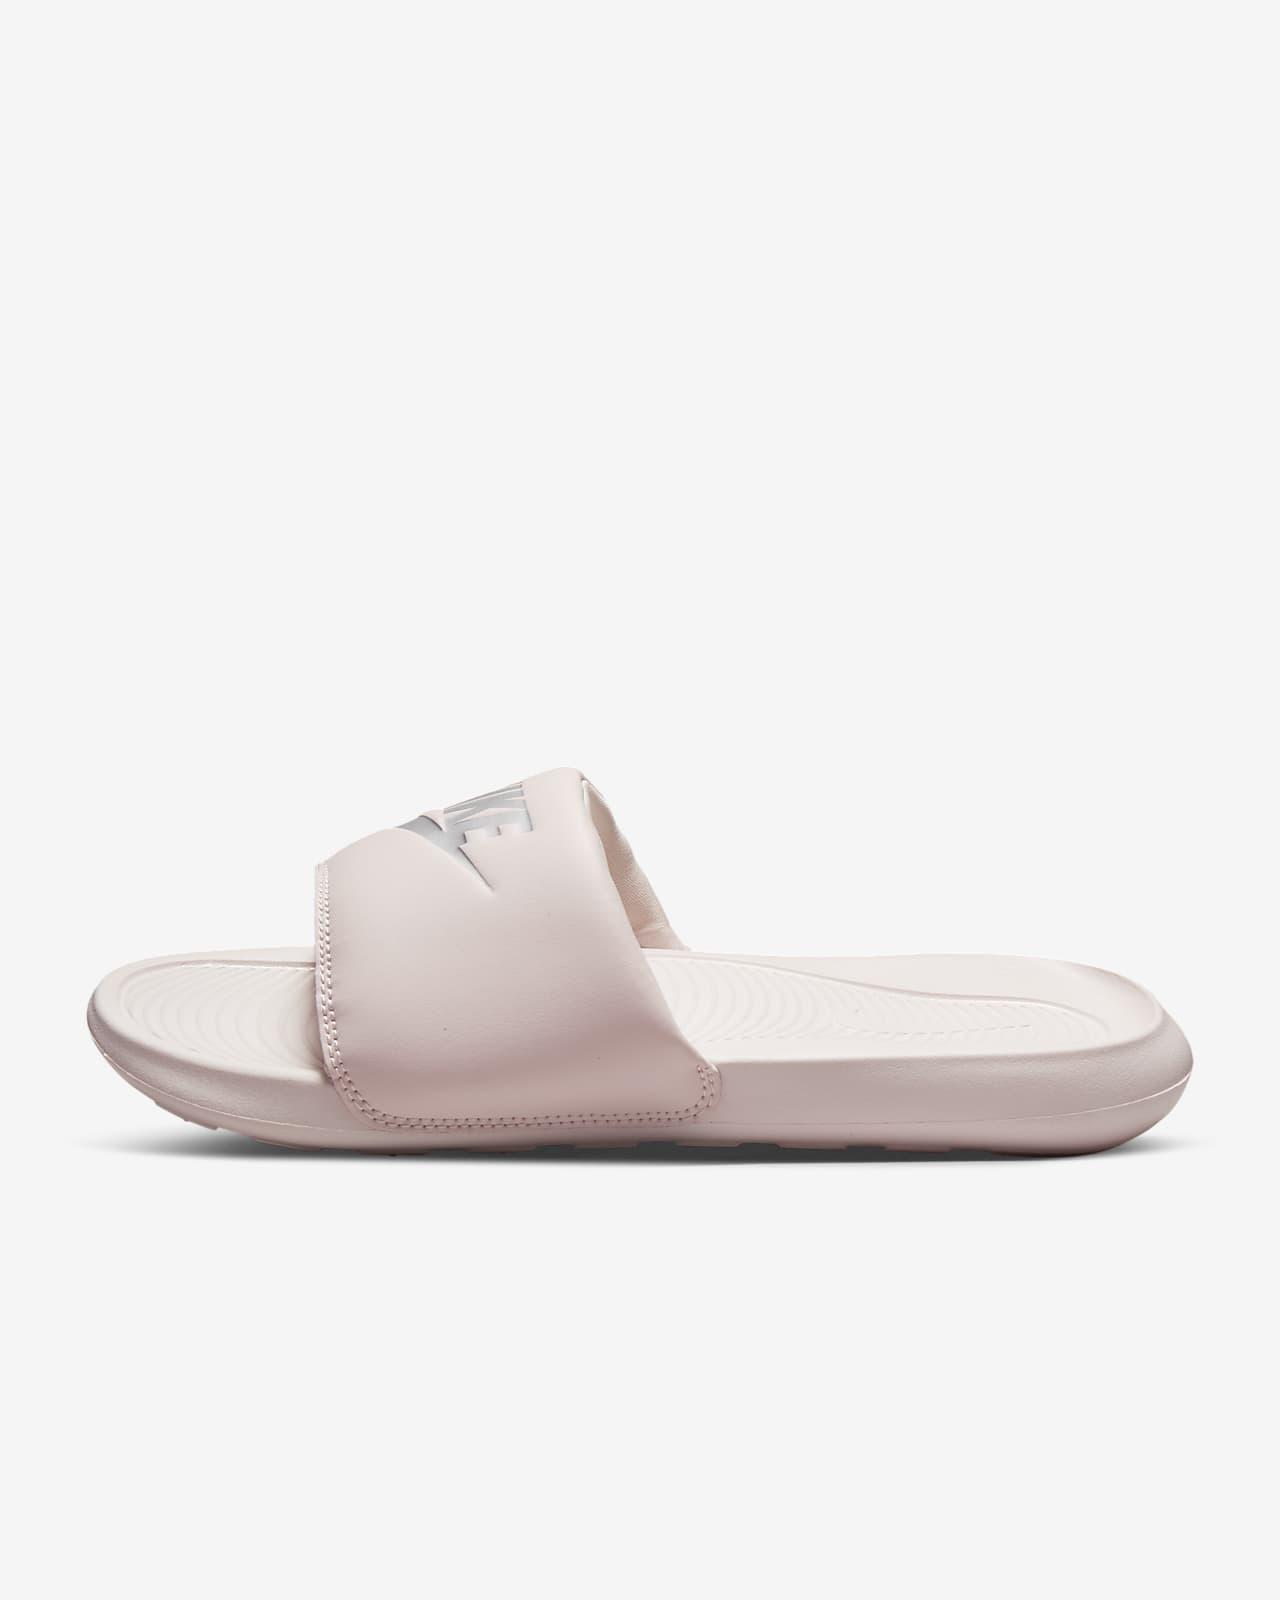 Nike Victori One Damen-Slides